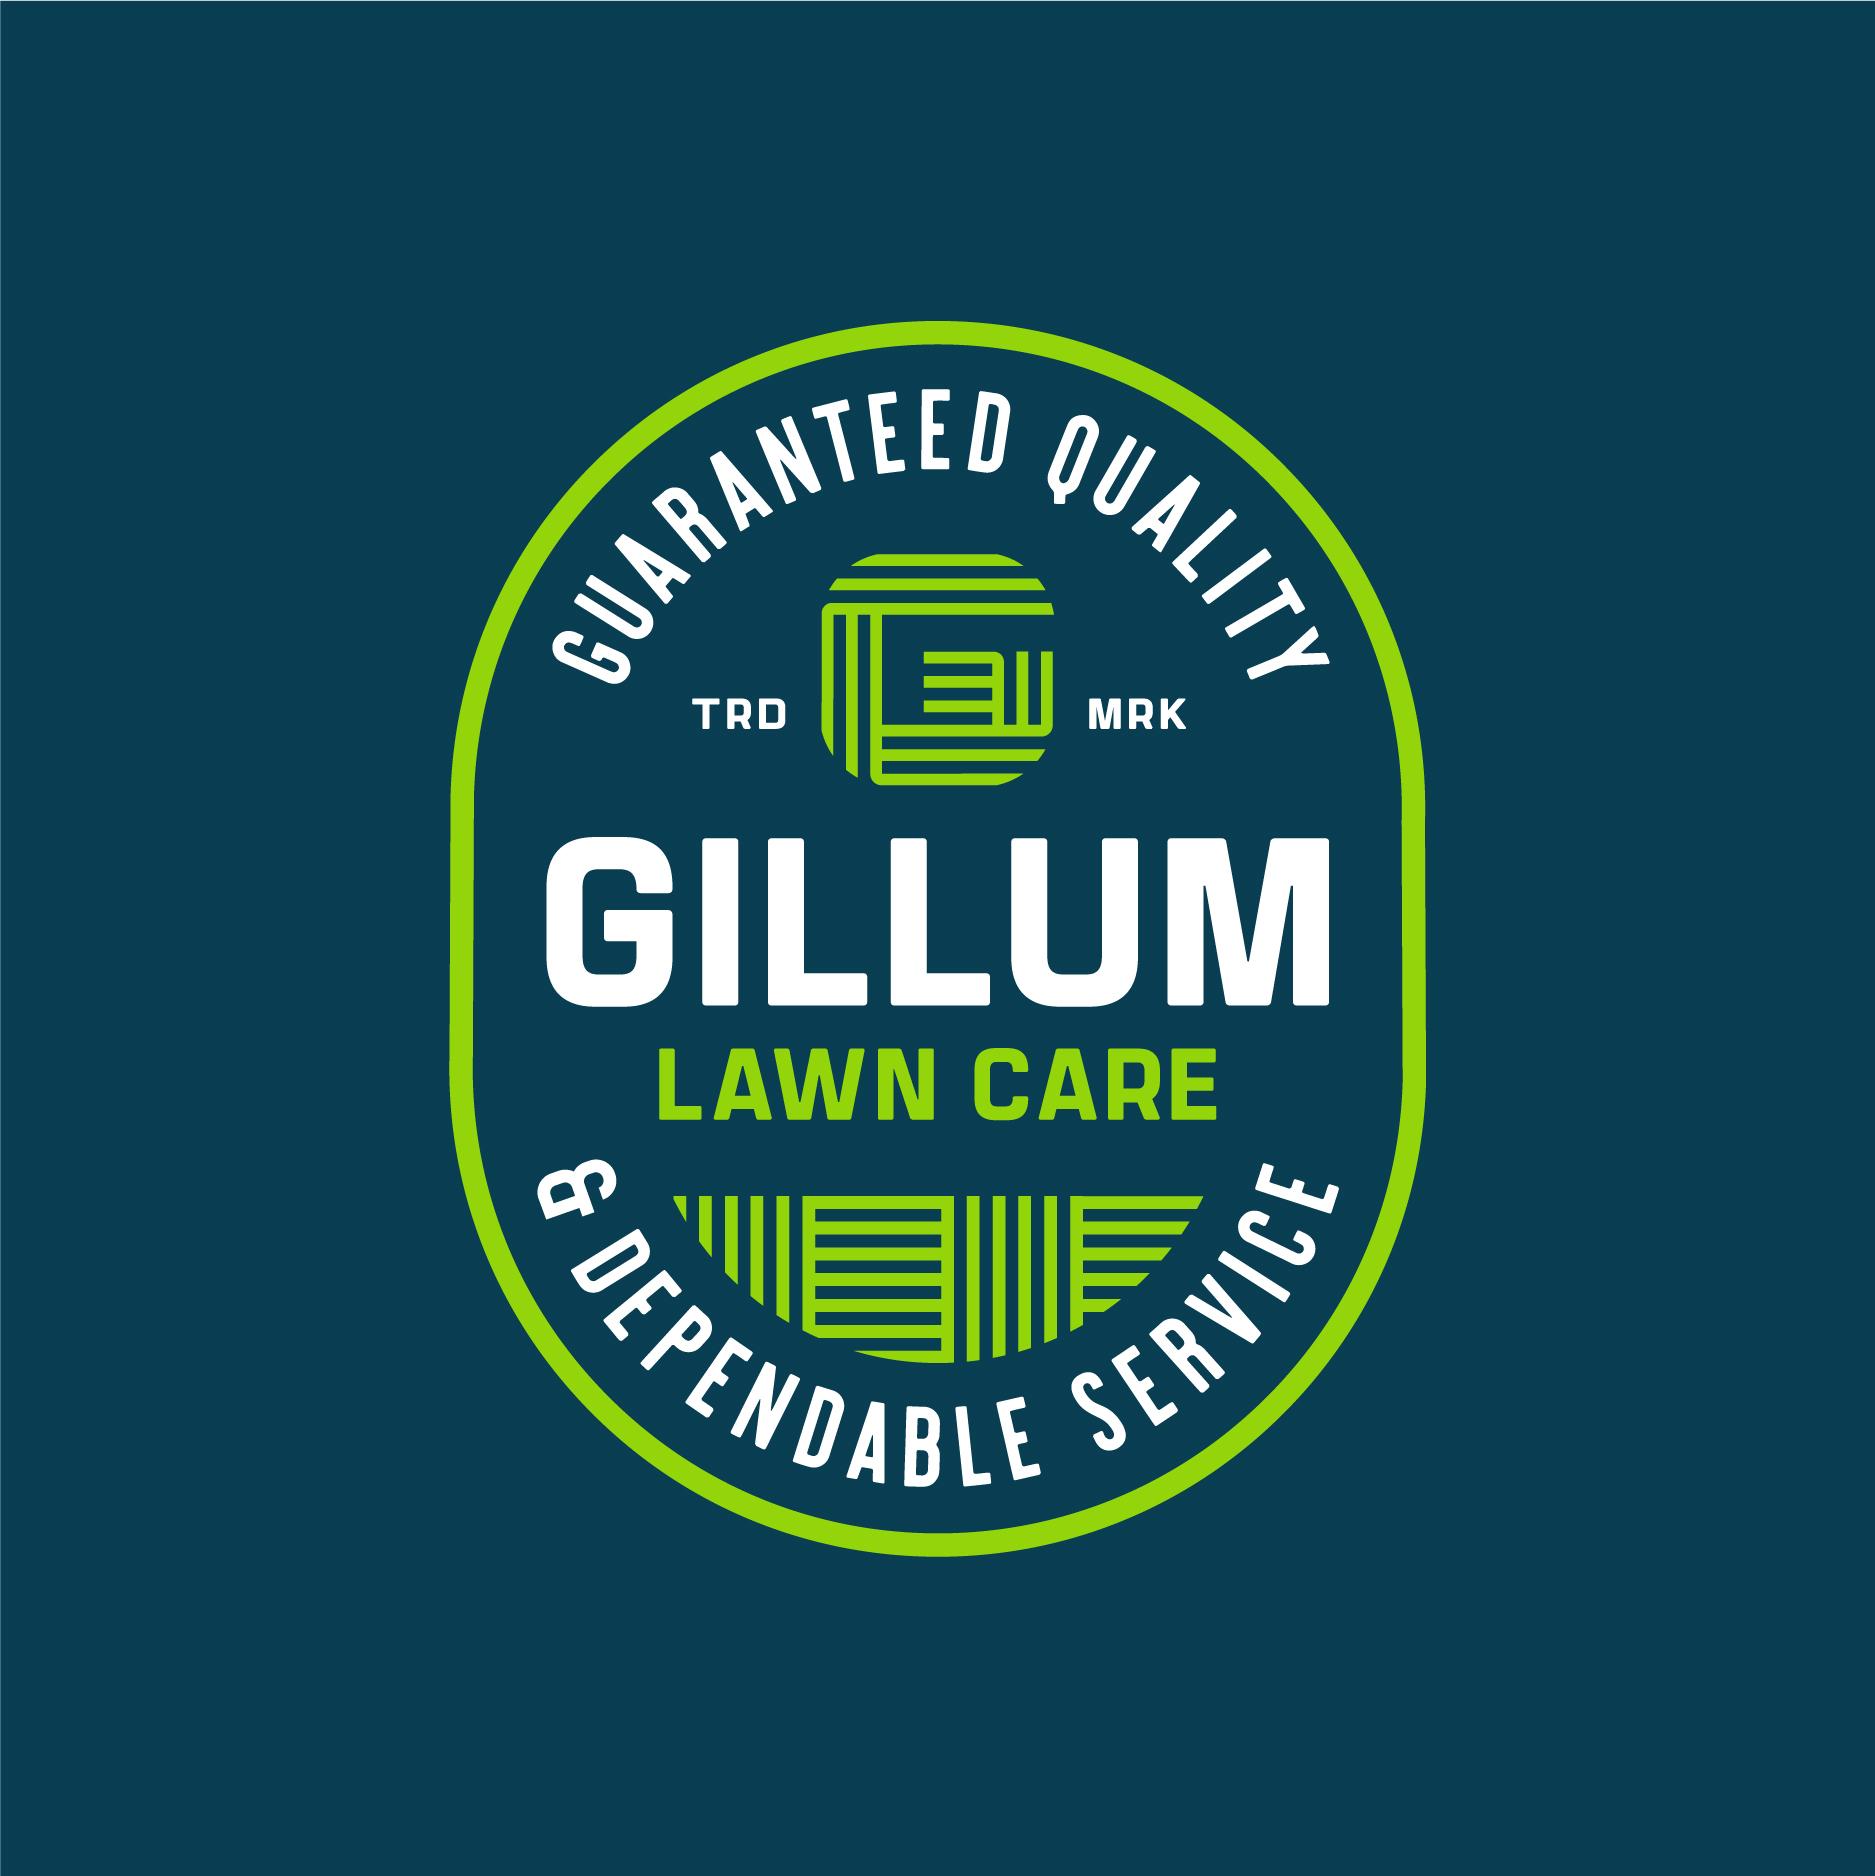 Gillum Lawn Care